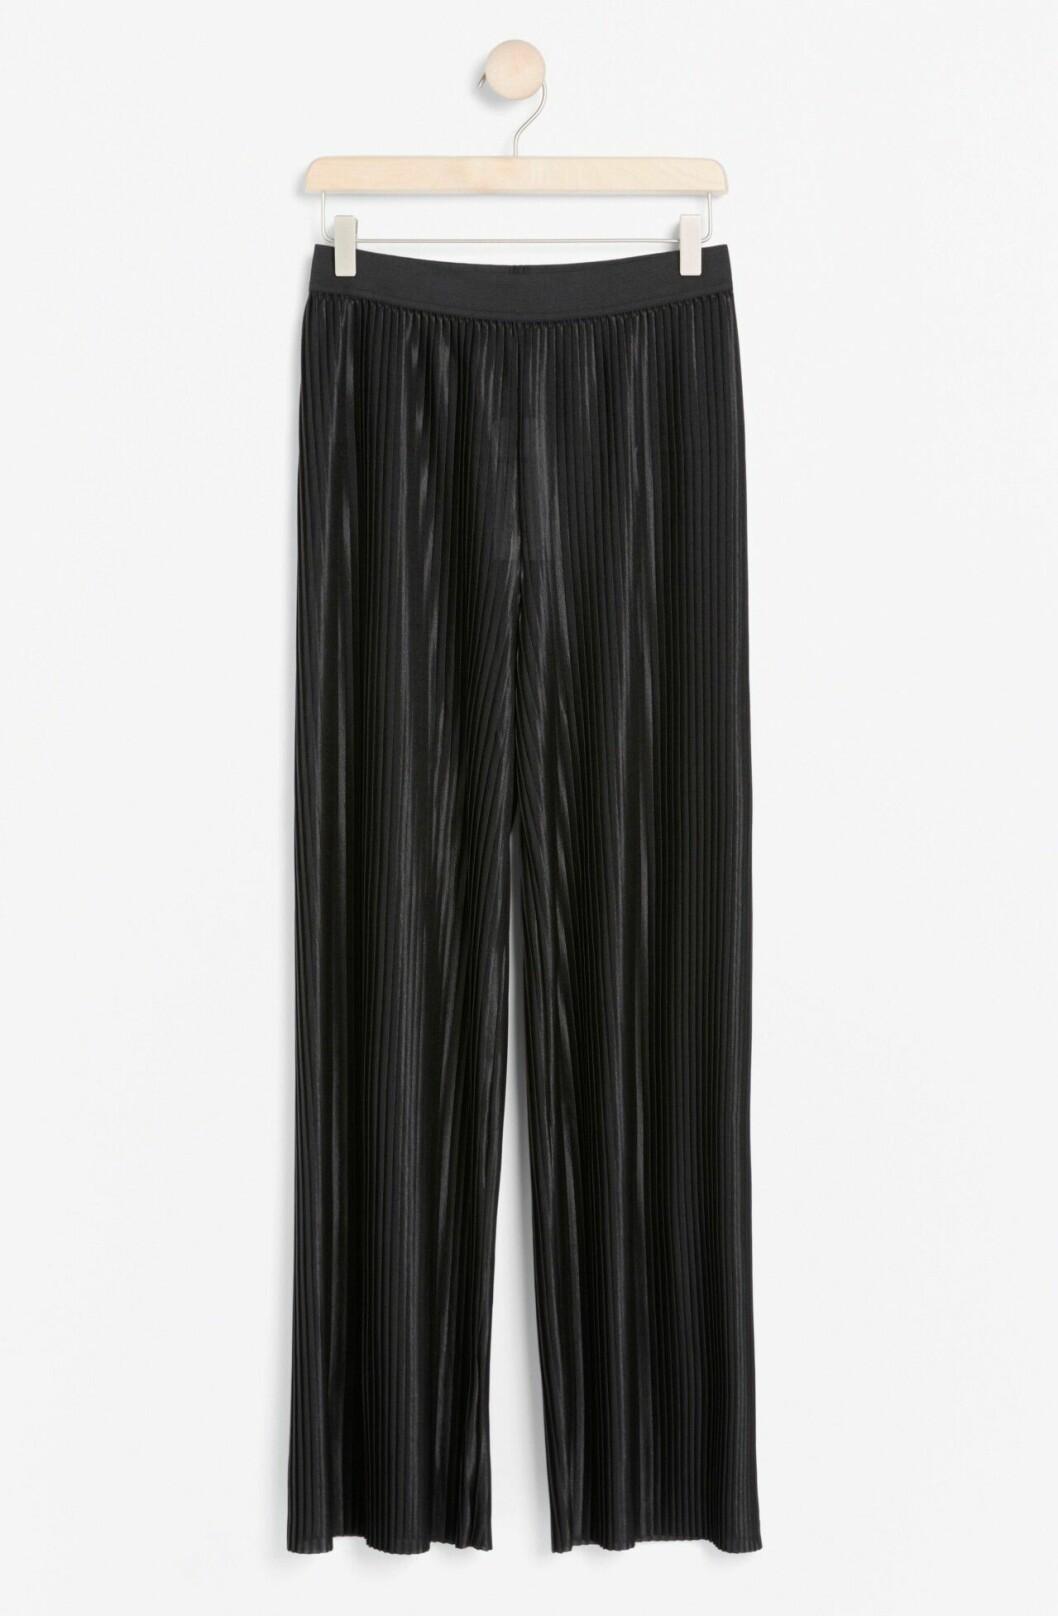 Matchande set: Svarta plisserade byxor